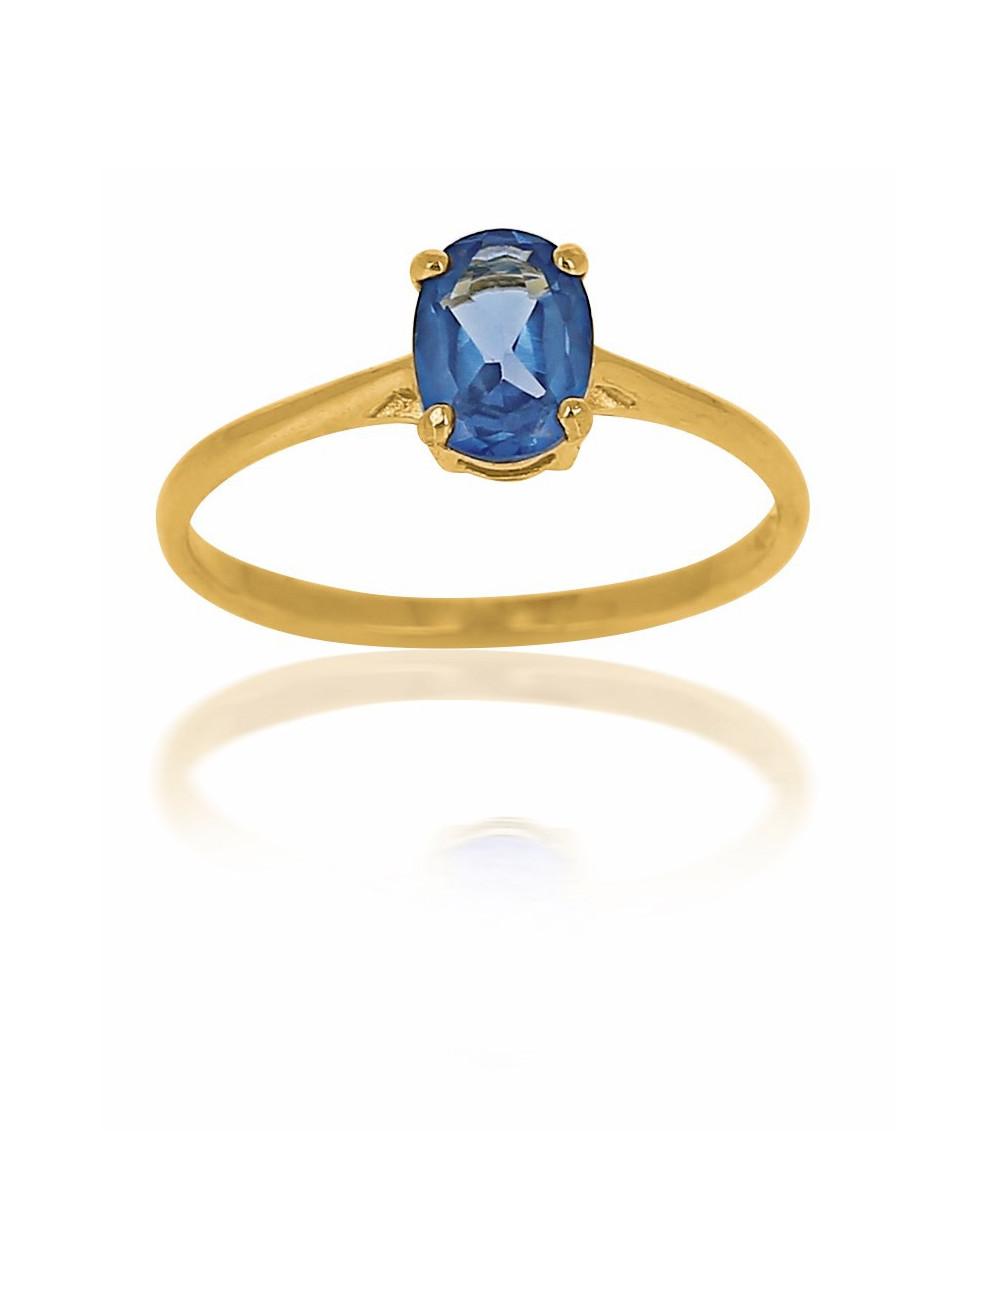 bague femme en or jaune 18 carats avec pierre bleue. Black Bedroom Furniture Sets. Home Design Ideas